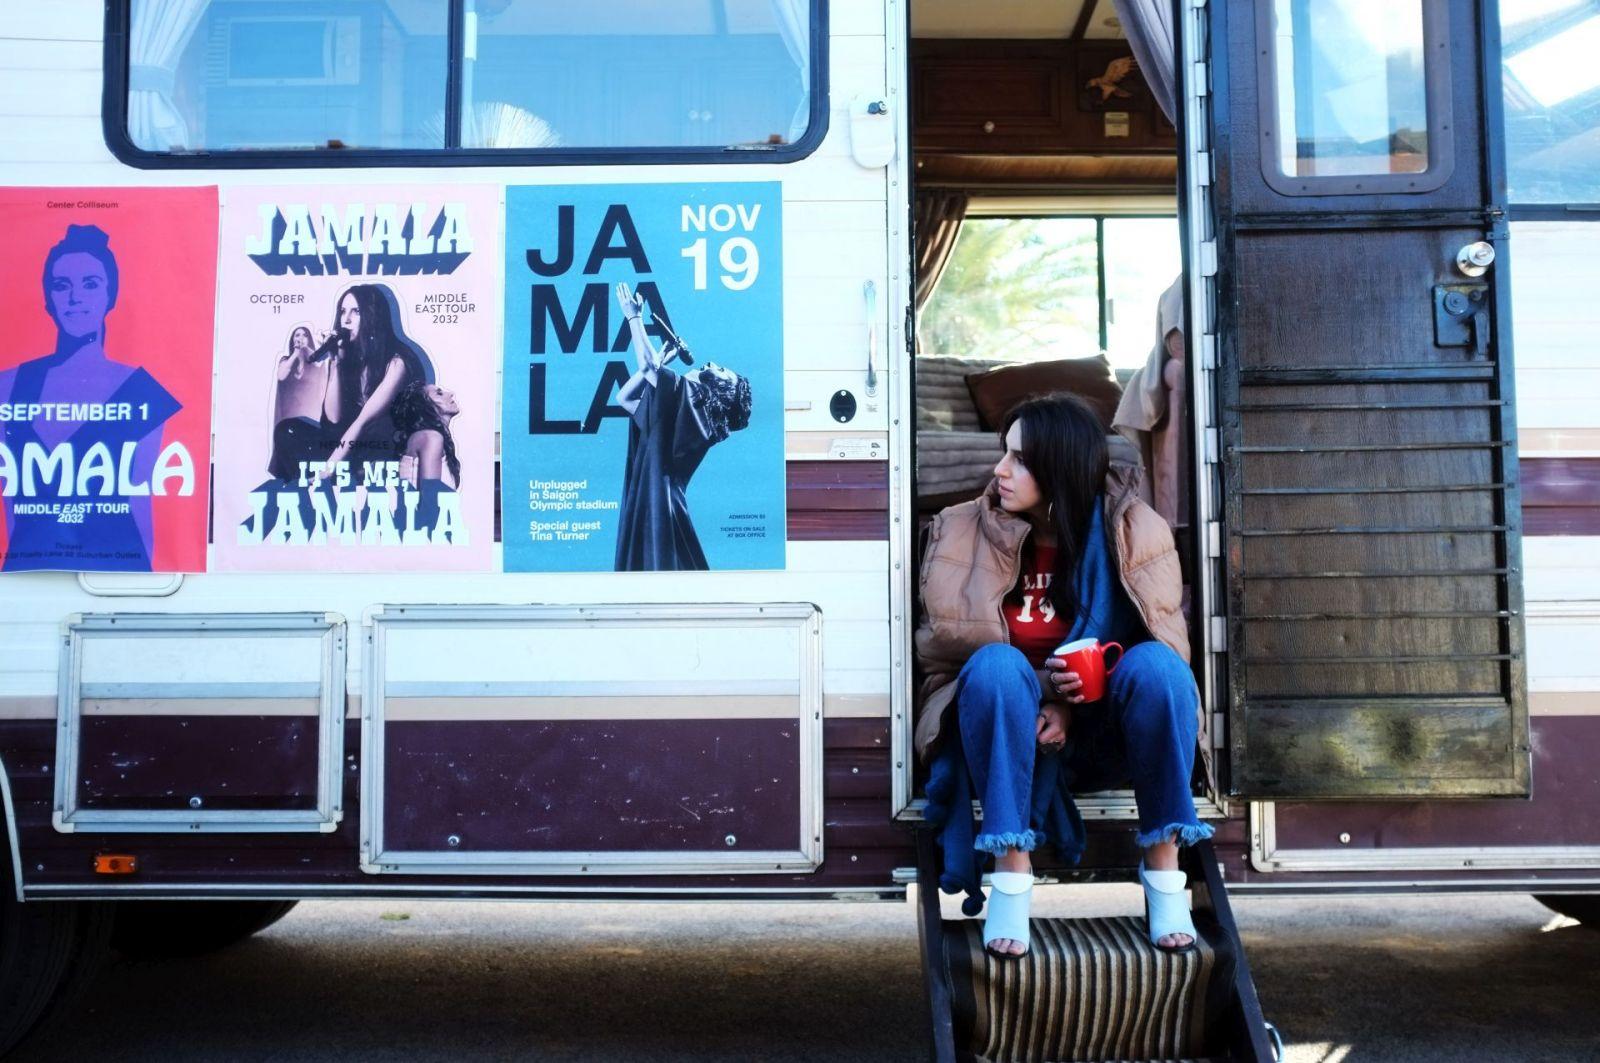 Так нежно и безумно красиво: Джамала представила клип Сумую